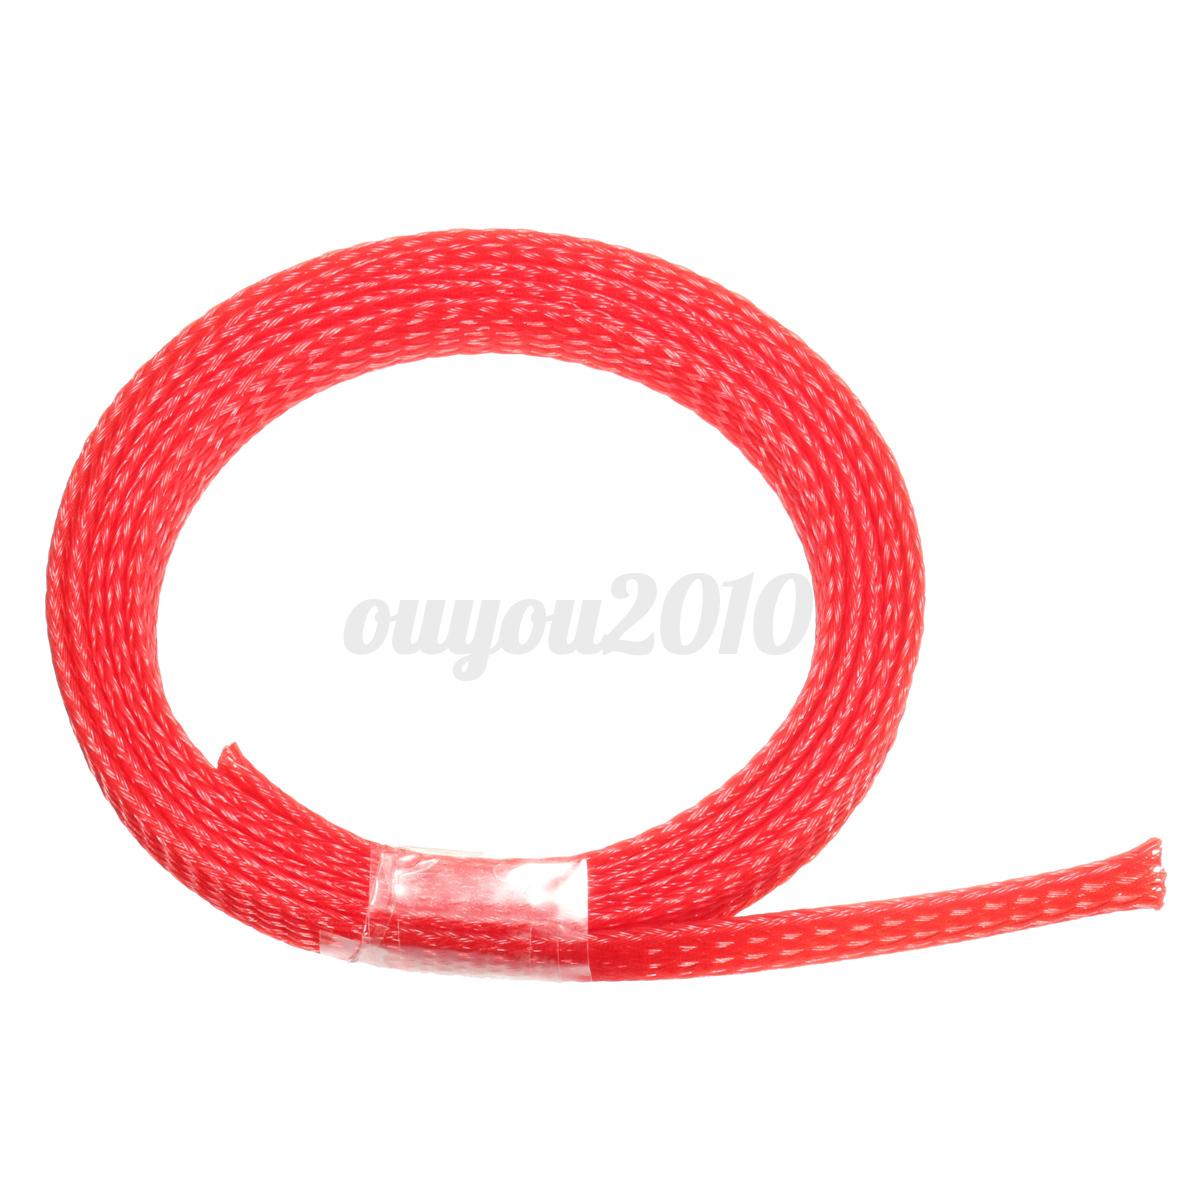 1999 gmc wire harness wire harness mesh #12